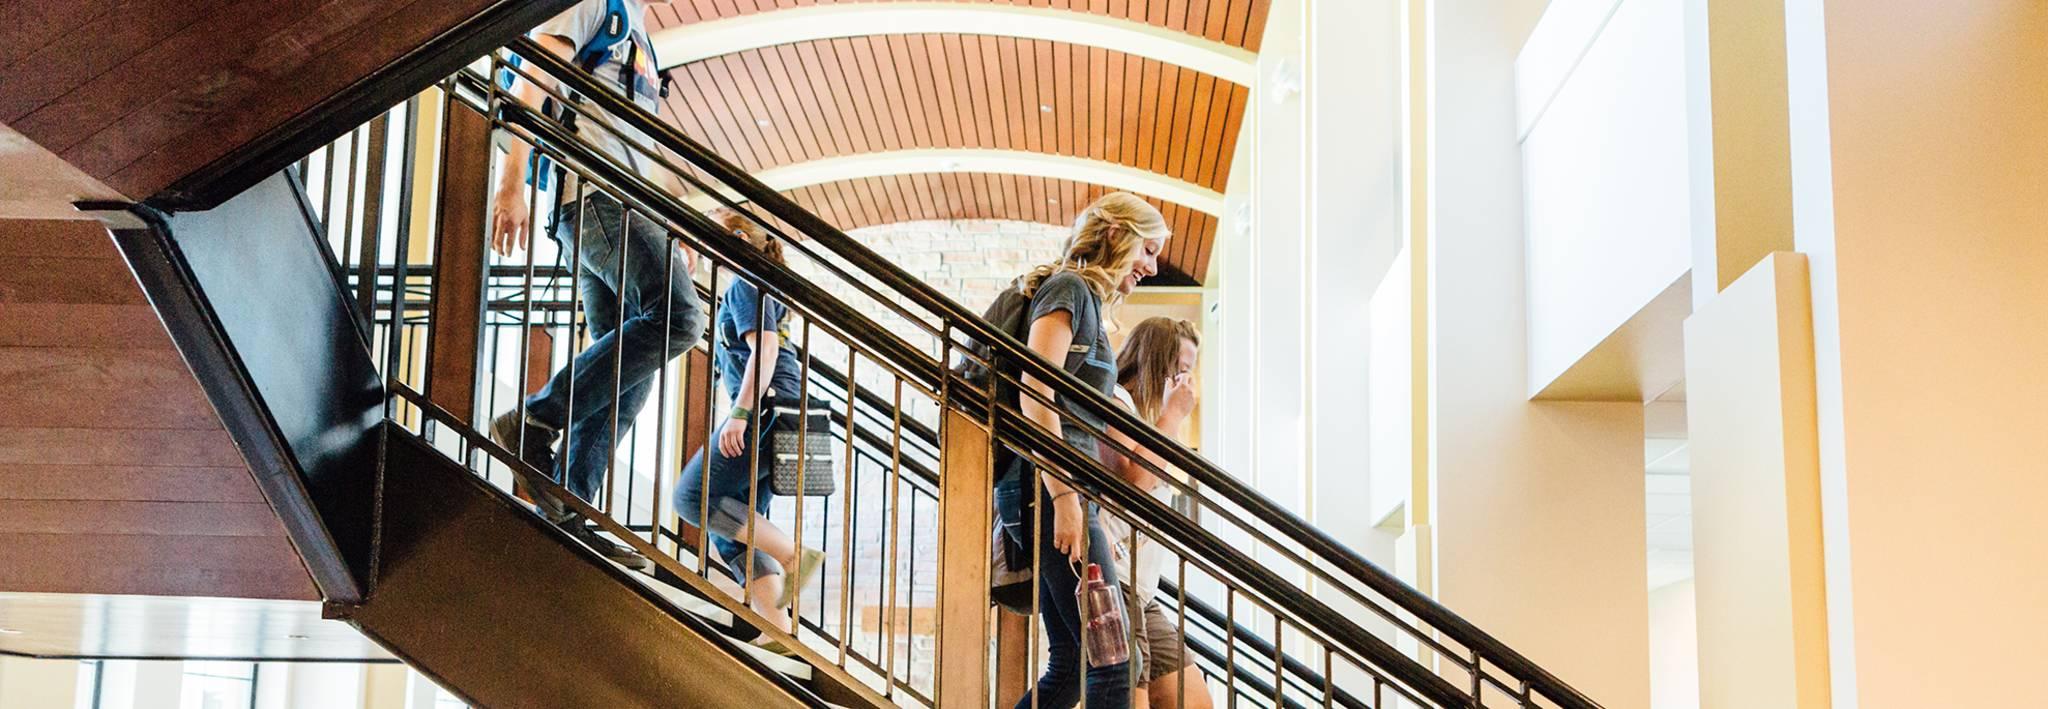 Colorado Christian University students in Leprino Hall.